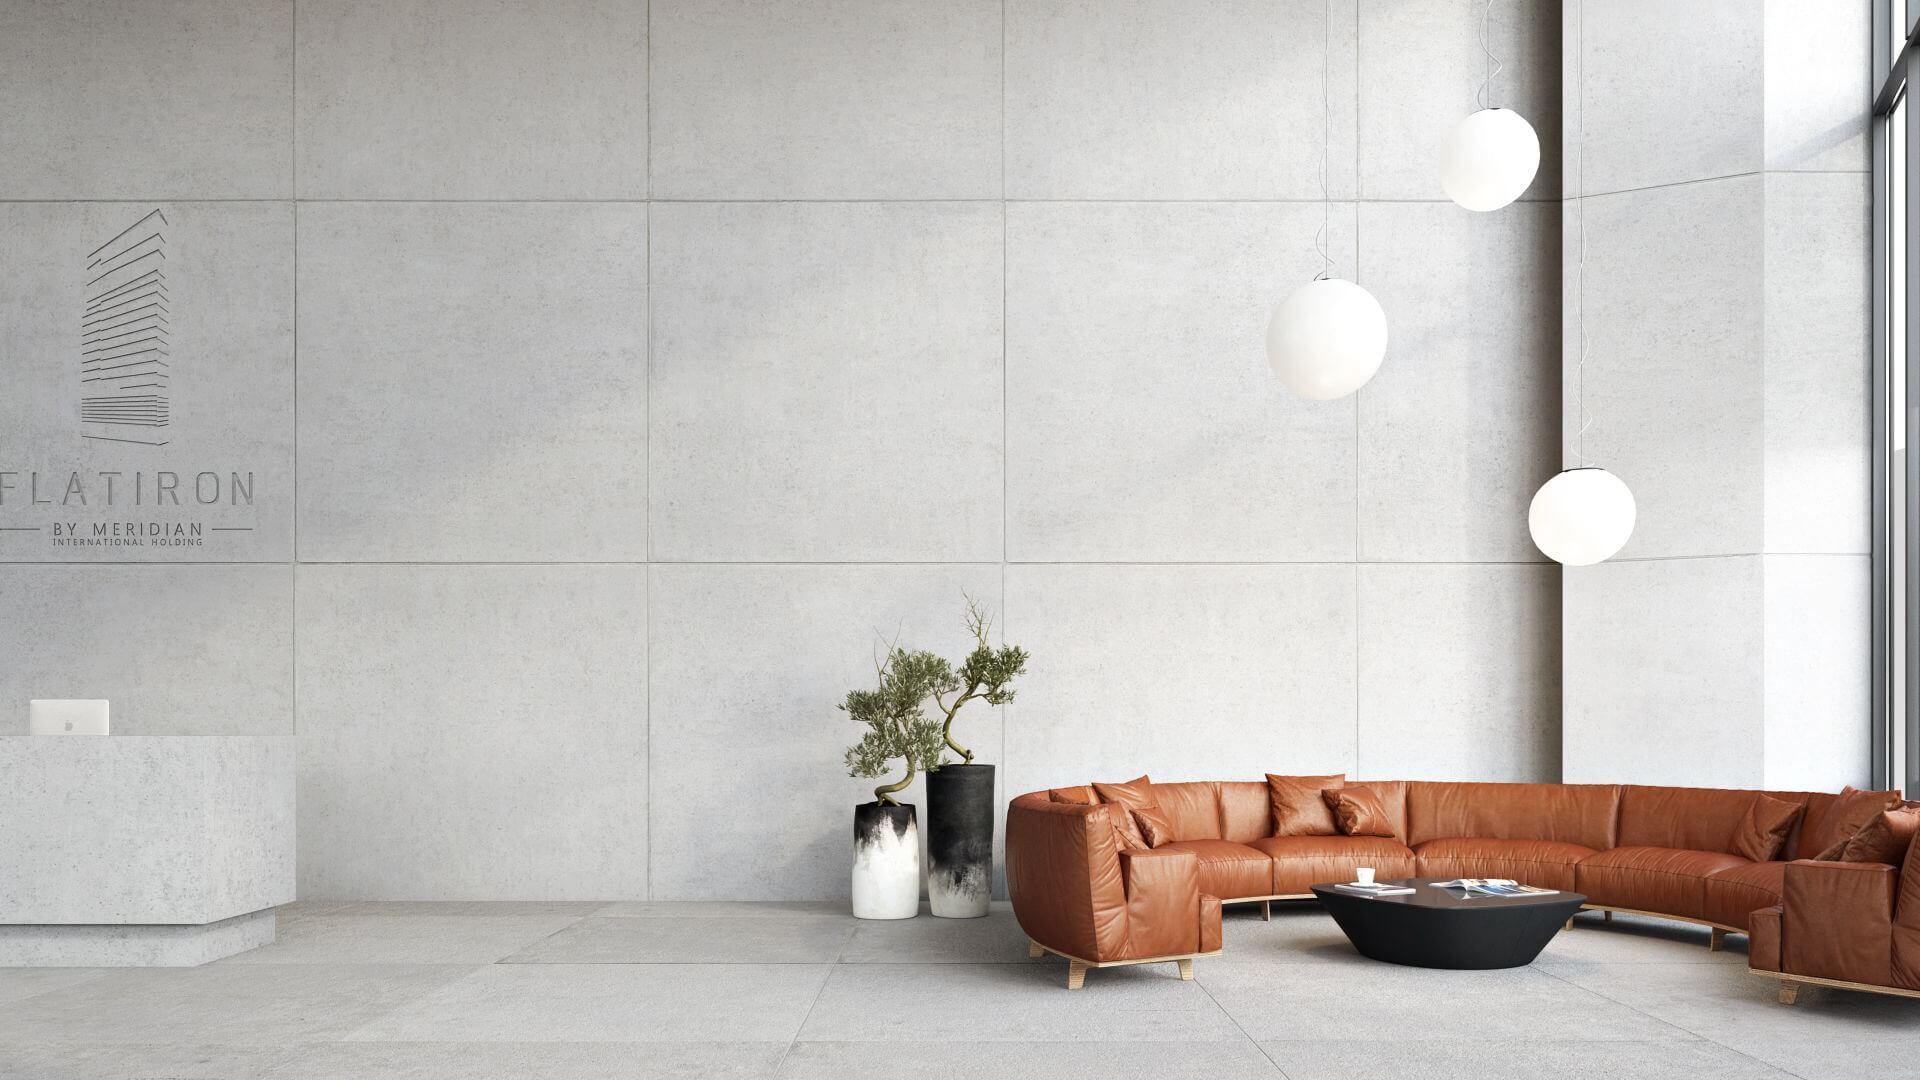 Flatiron Lobby Interior Design 3D Rendering